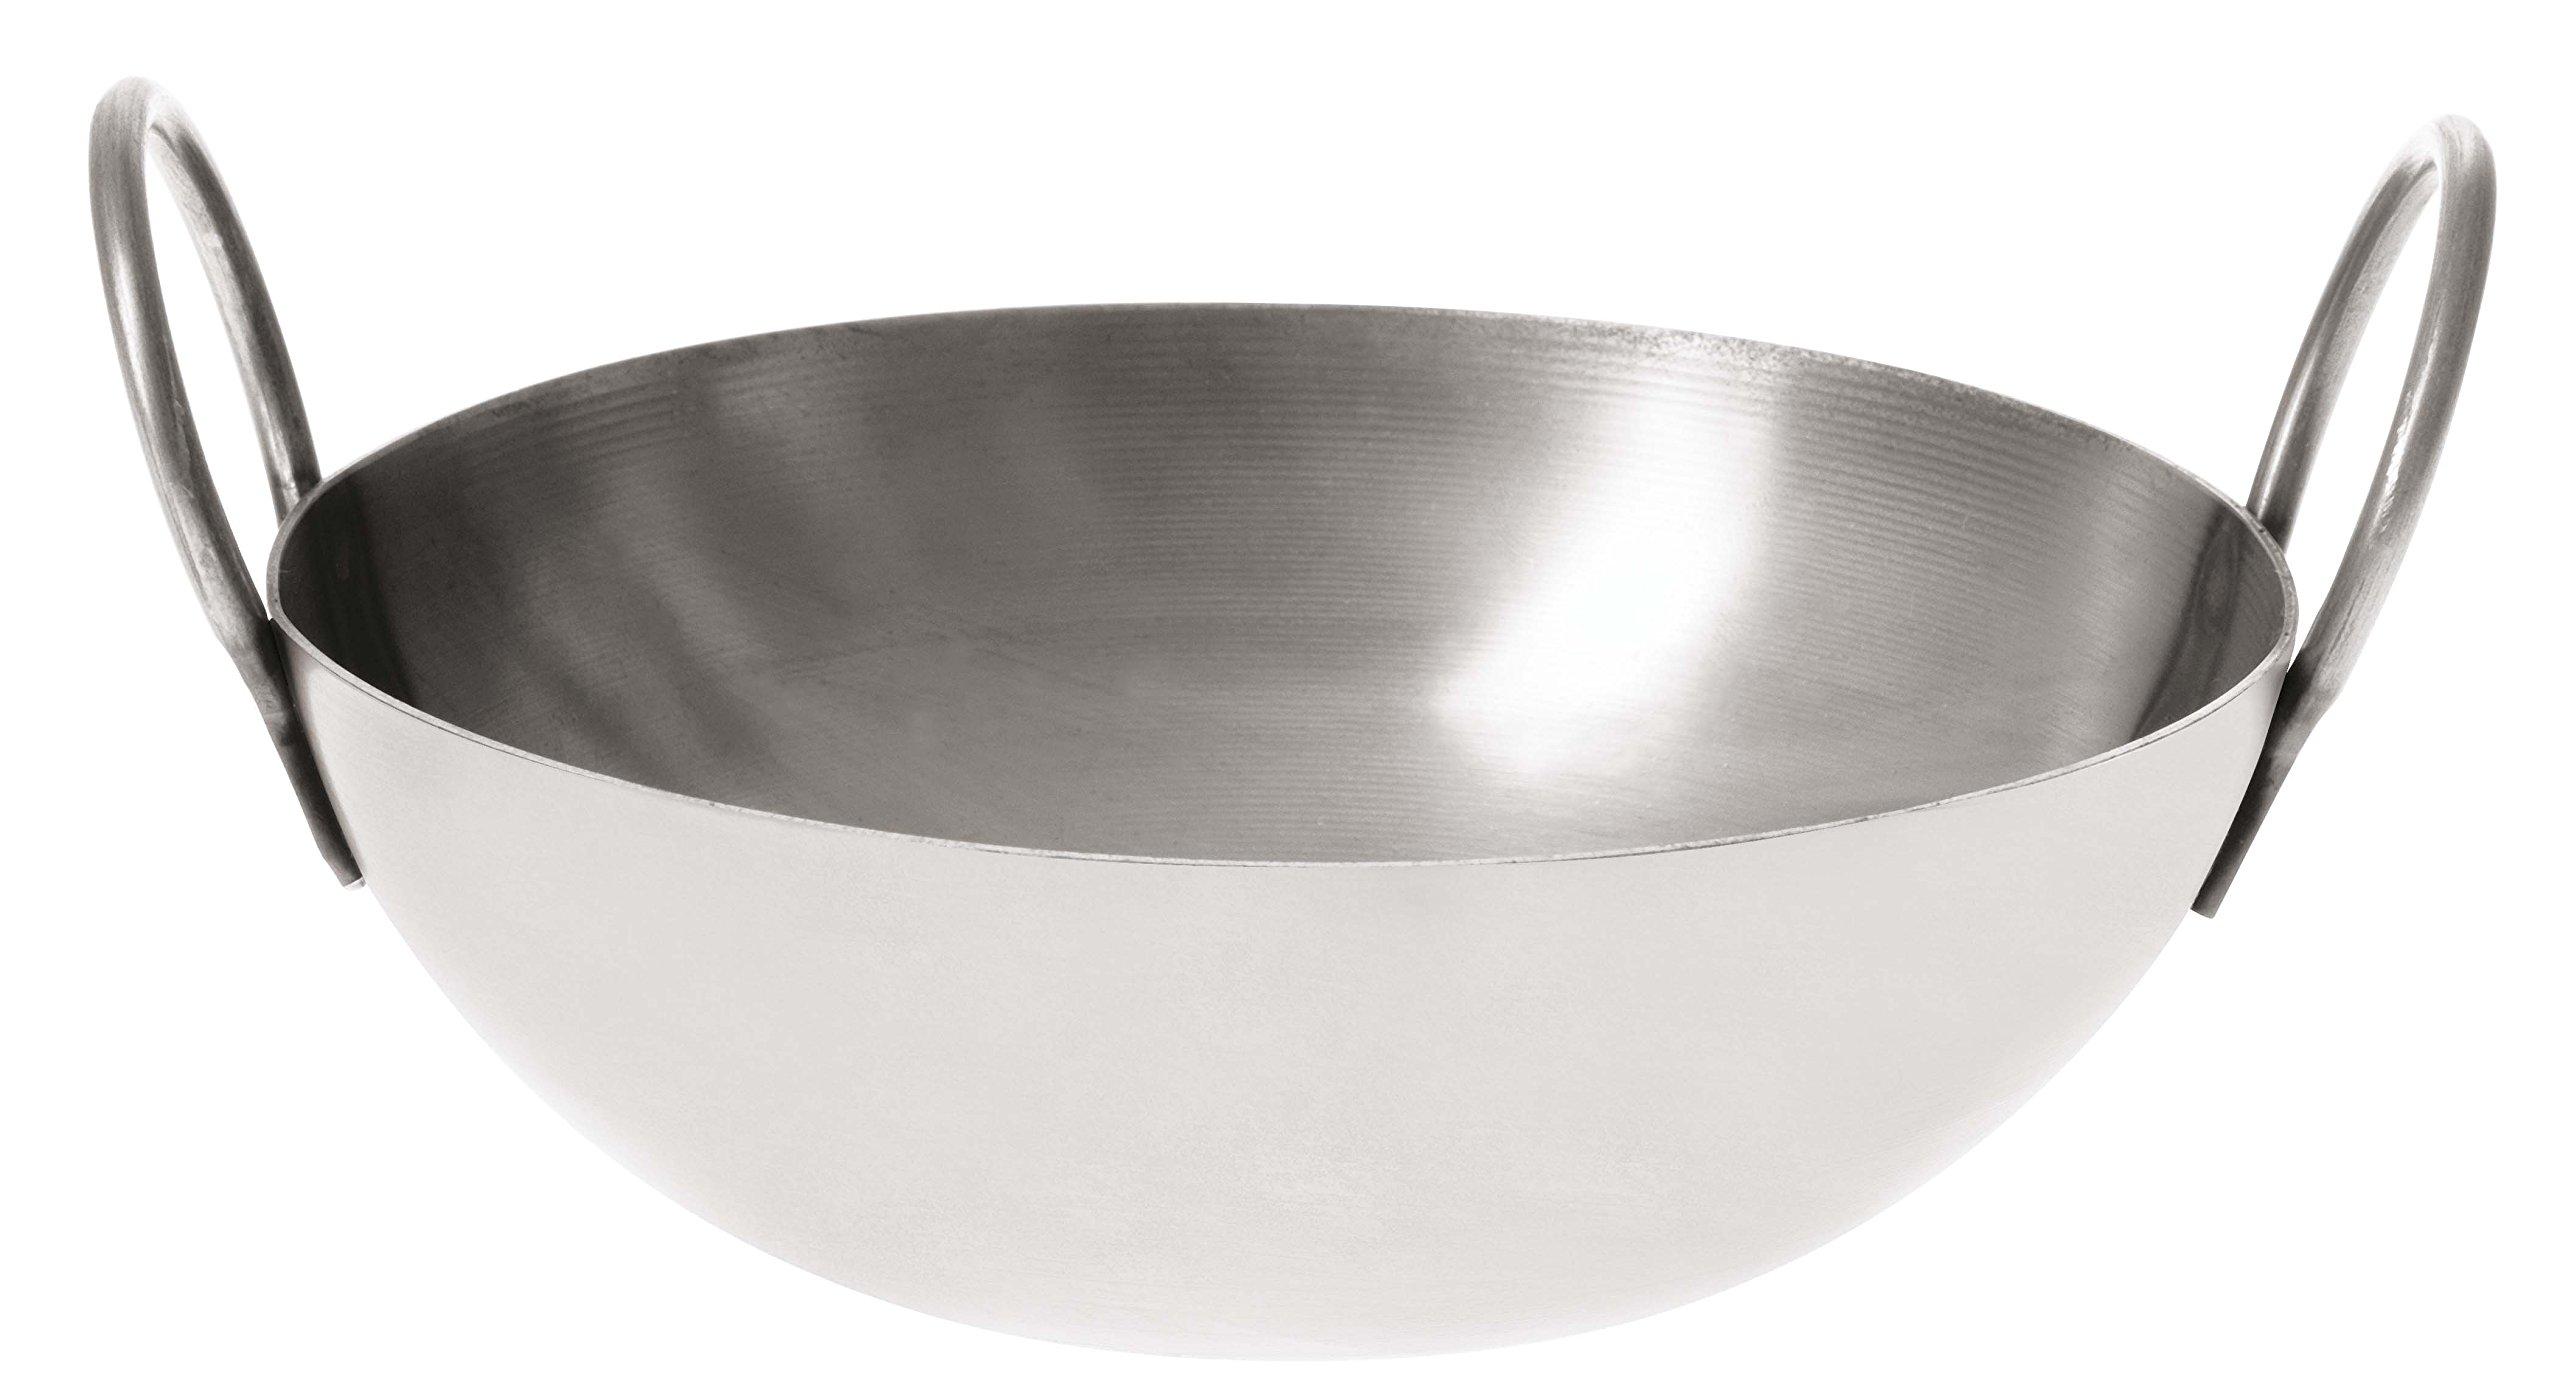 Paderno World Cuisine Stainless Steel Balti Pan, 6-Inch